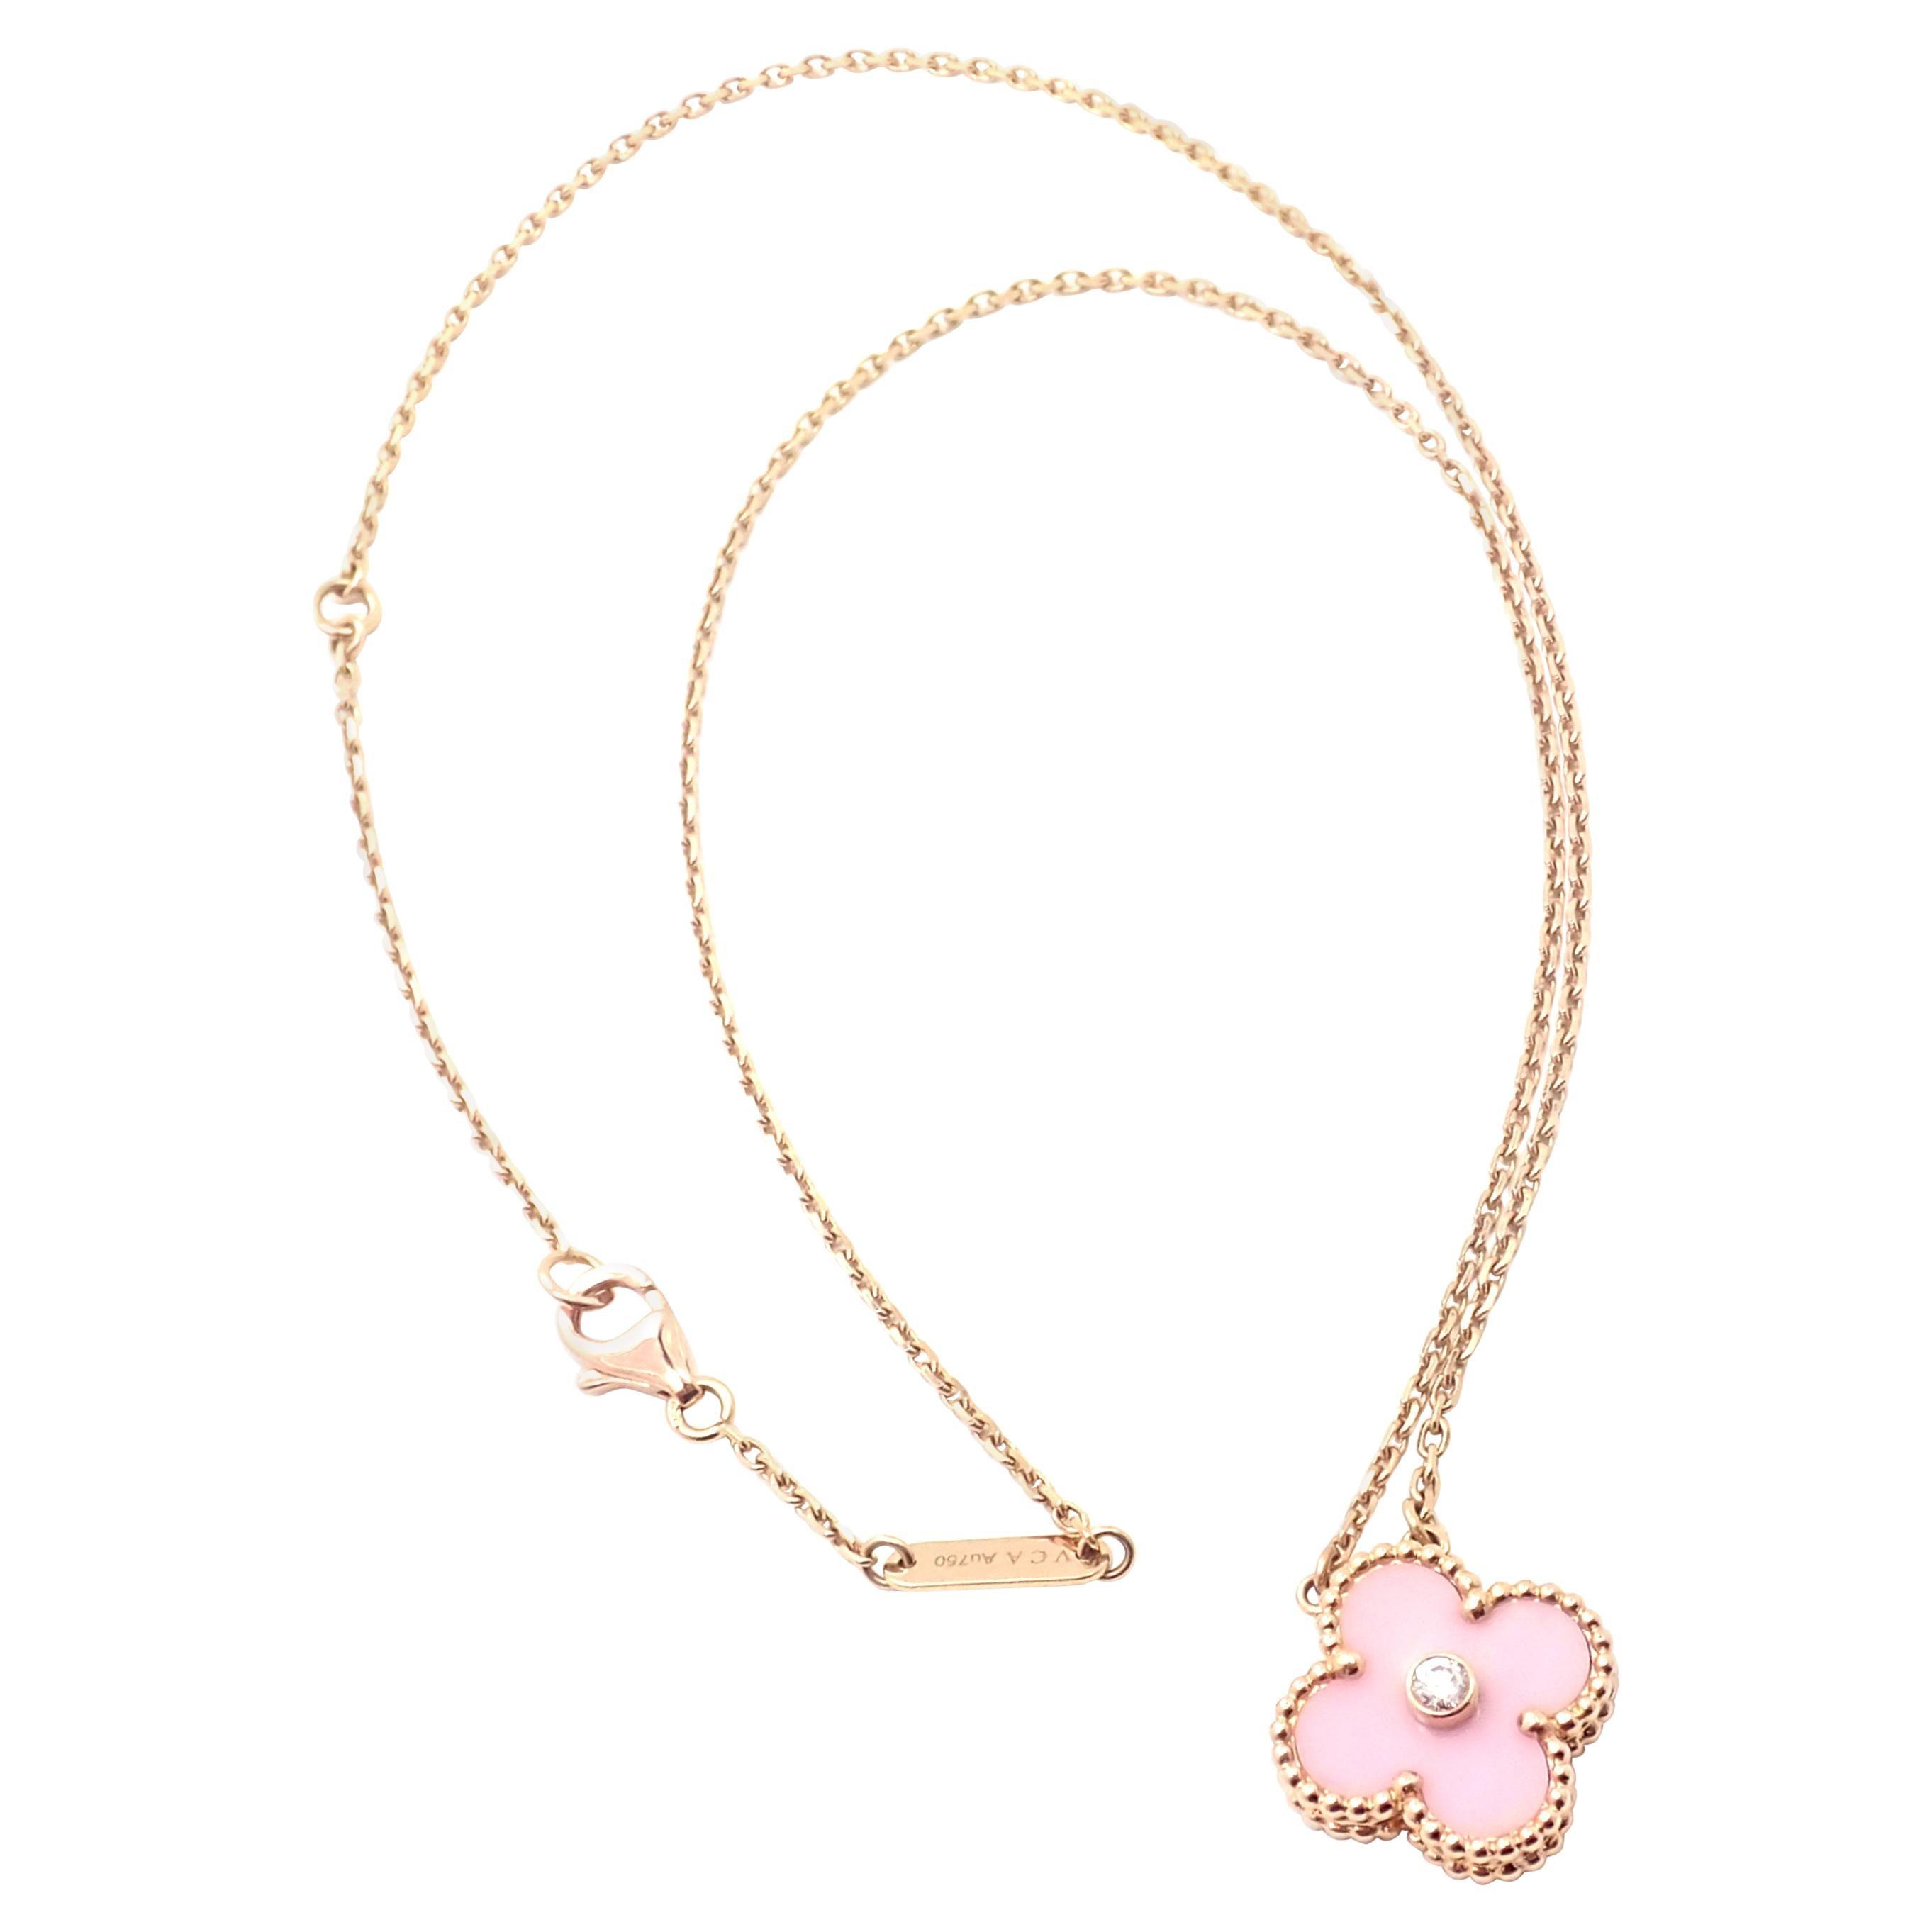 Van Cleef & Arpels Diamond Porcelain Limited Edition Alhambra Rose Gold Necklace